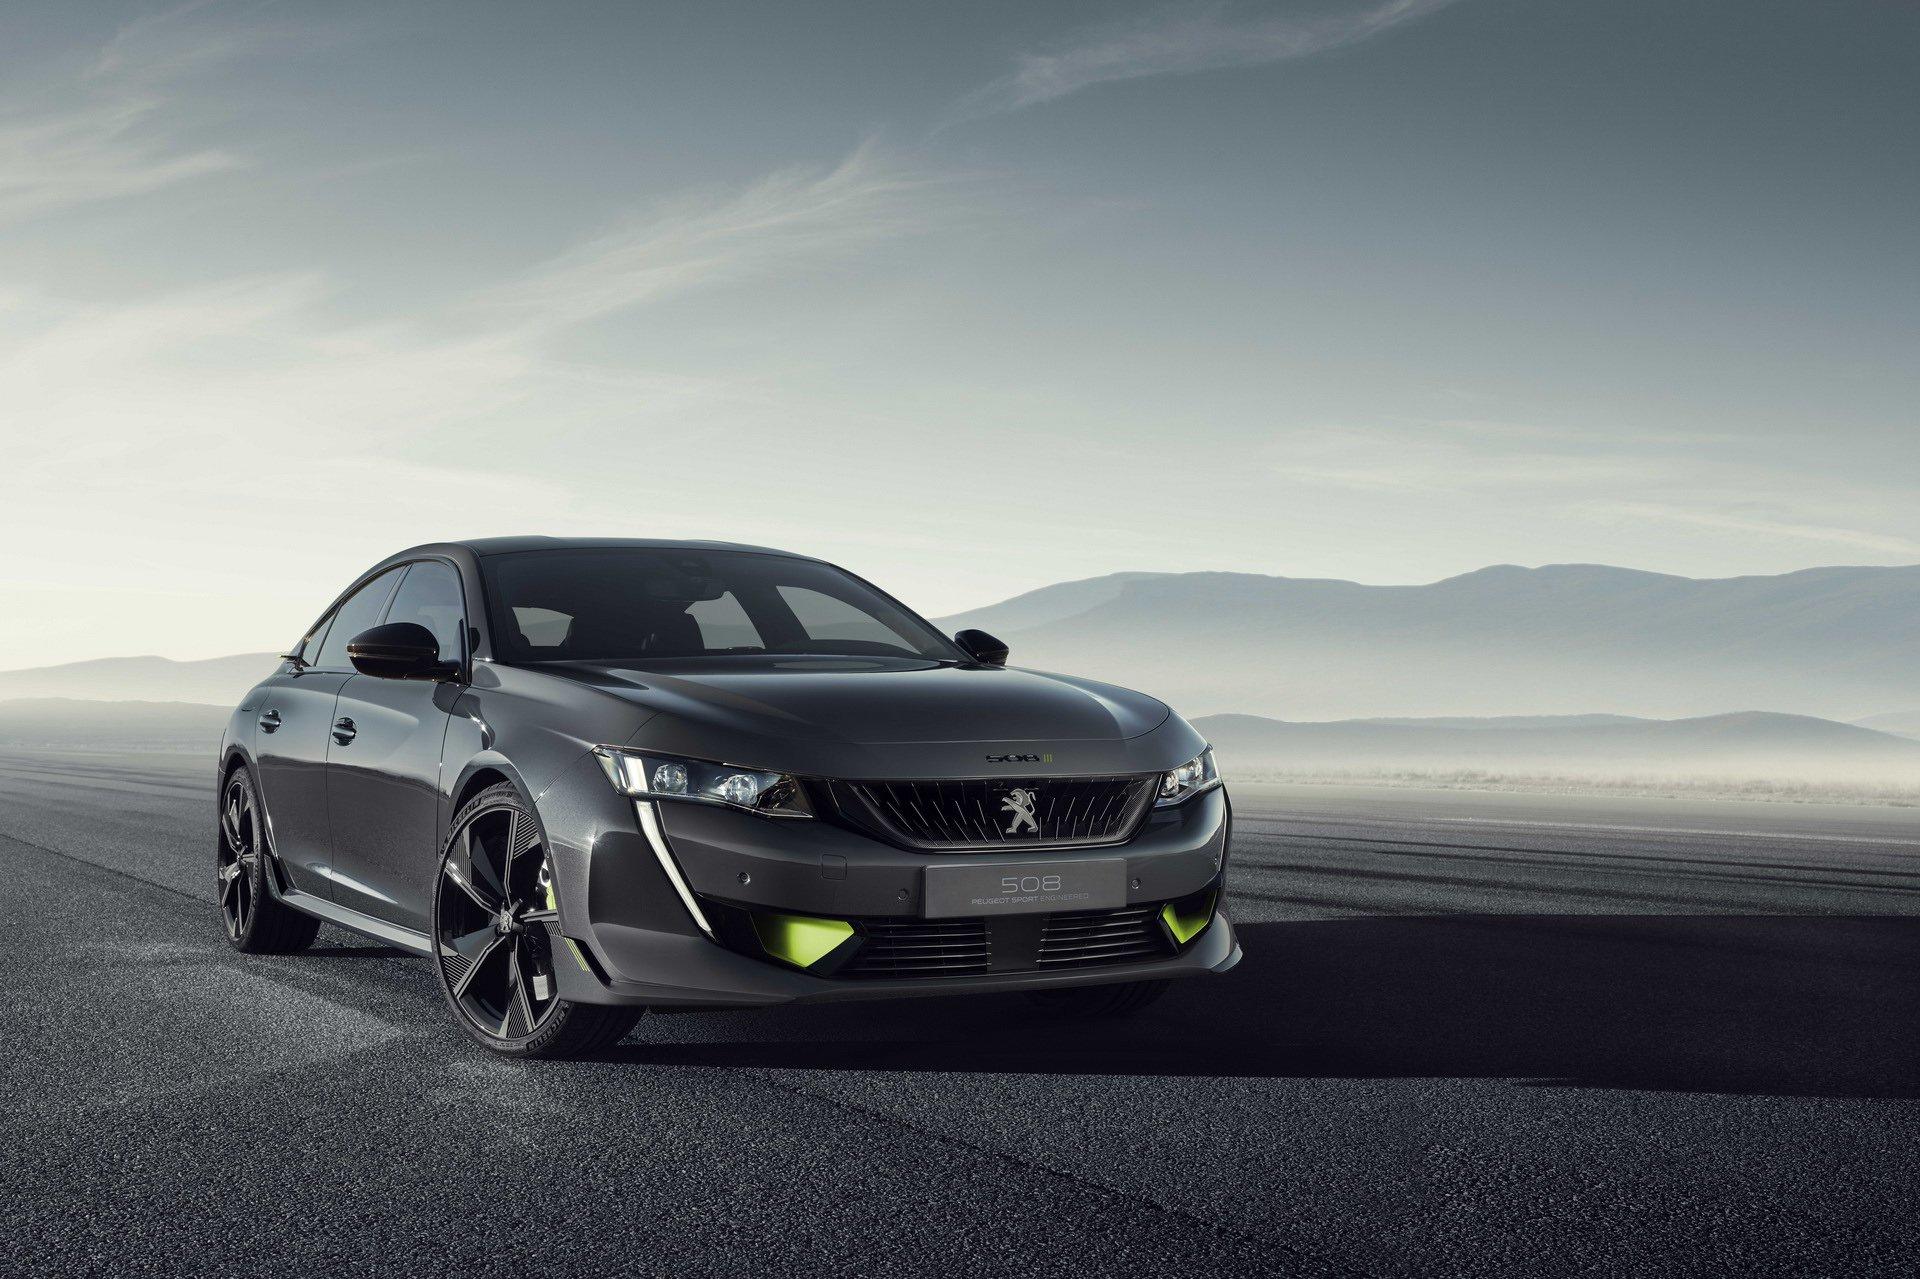 2019-Peugeot-508-Sport-Engineered-Concep